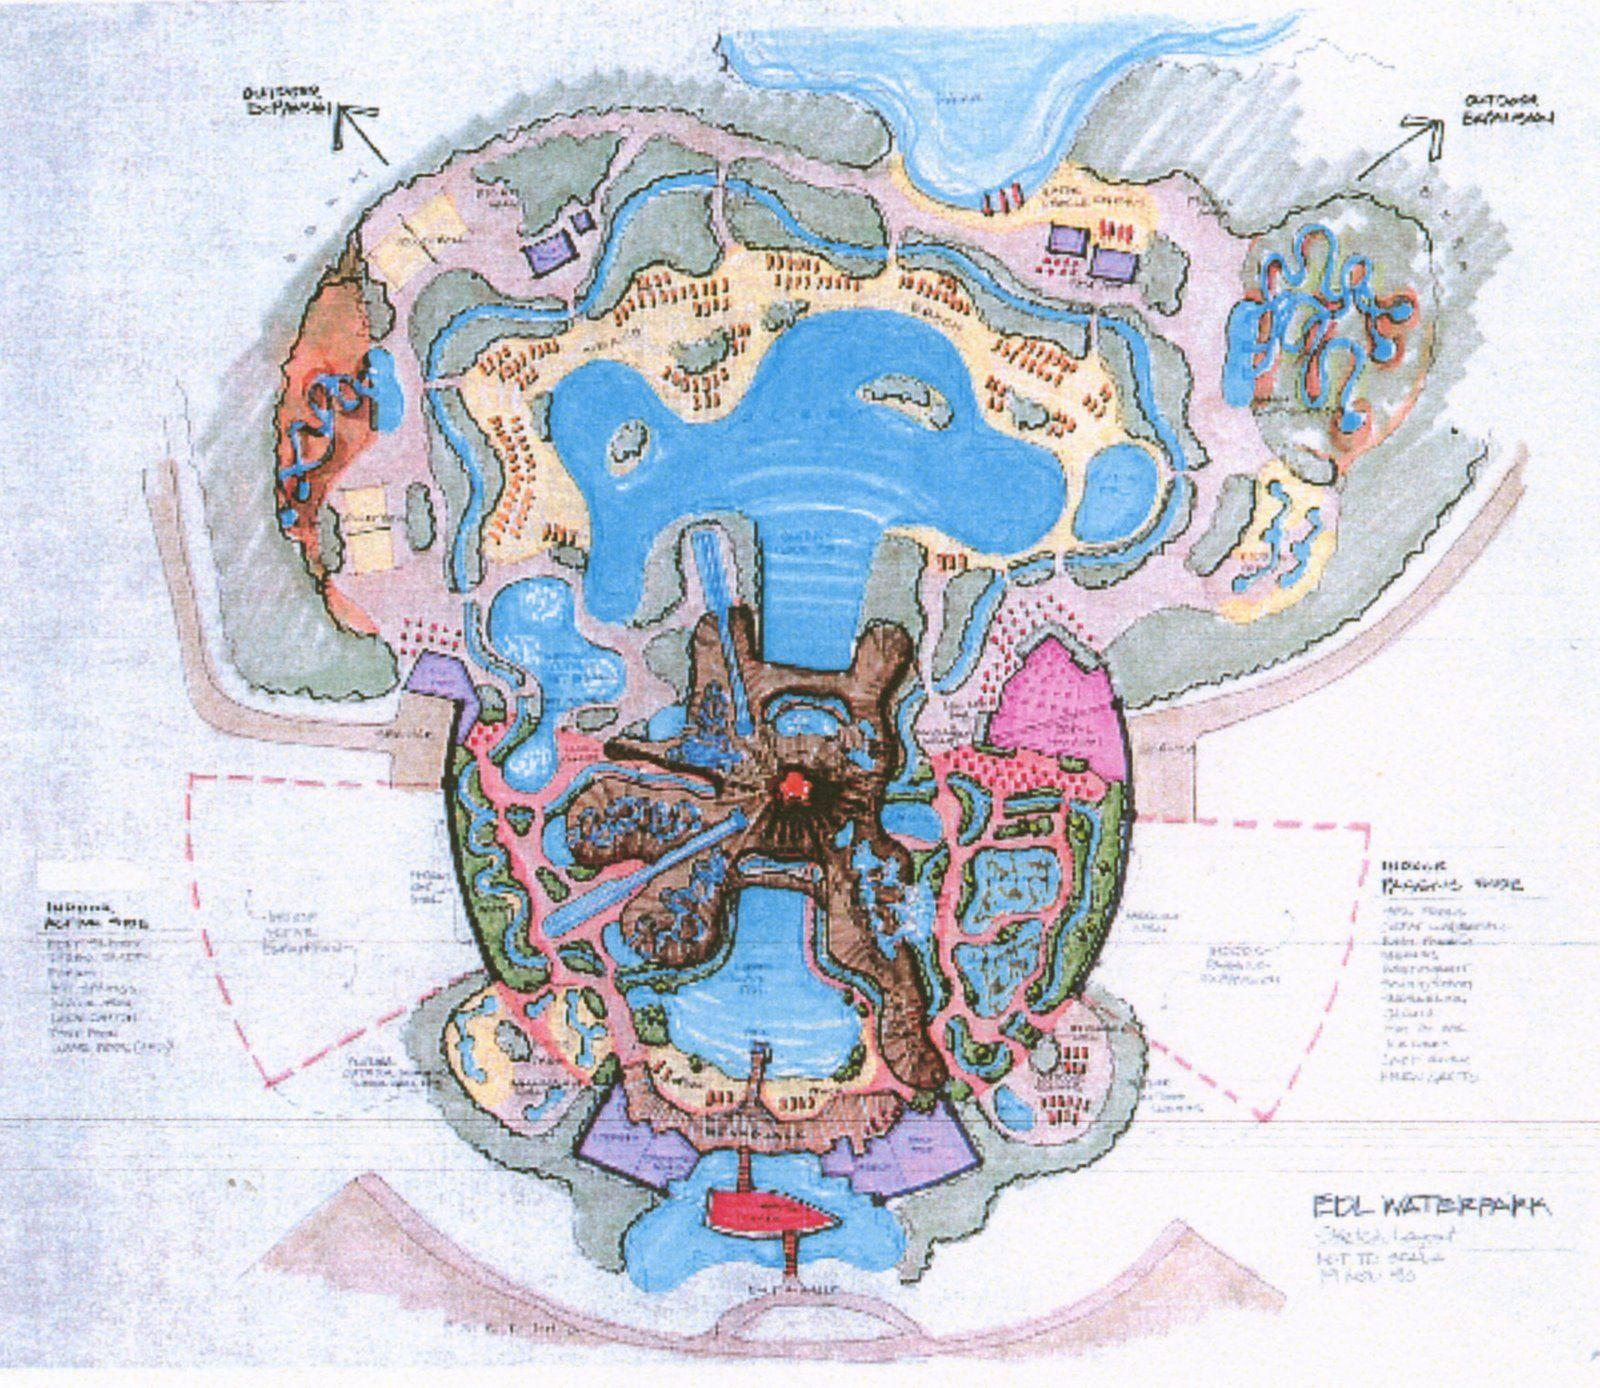 Disney's Lava Lagoon Water Park, Disneyland Paris (never